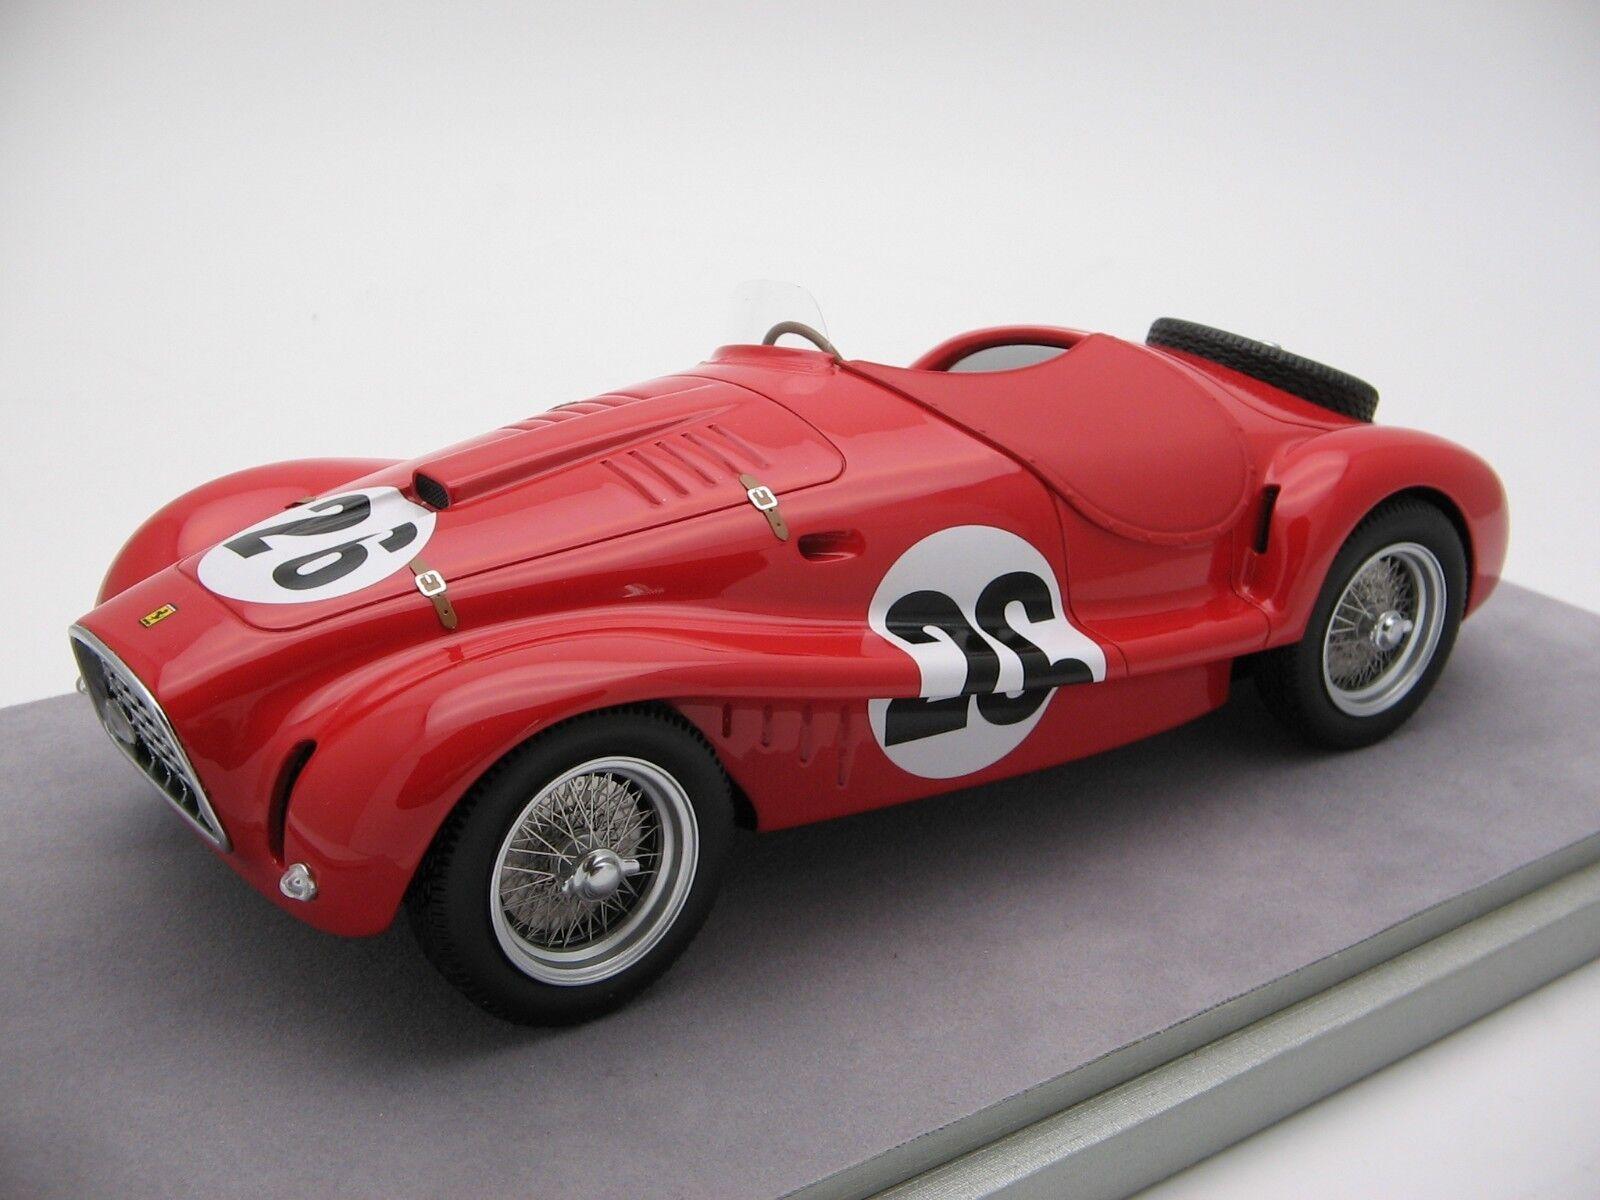 1 18 scale Tecnomodel Ferrari 225S Spyder Vignale GP Portugal 1952 TM18-81D